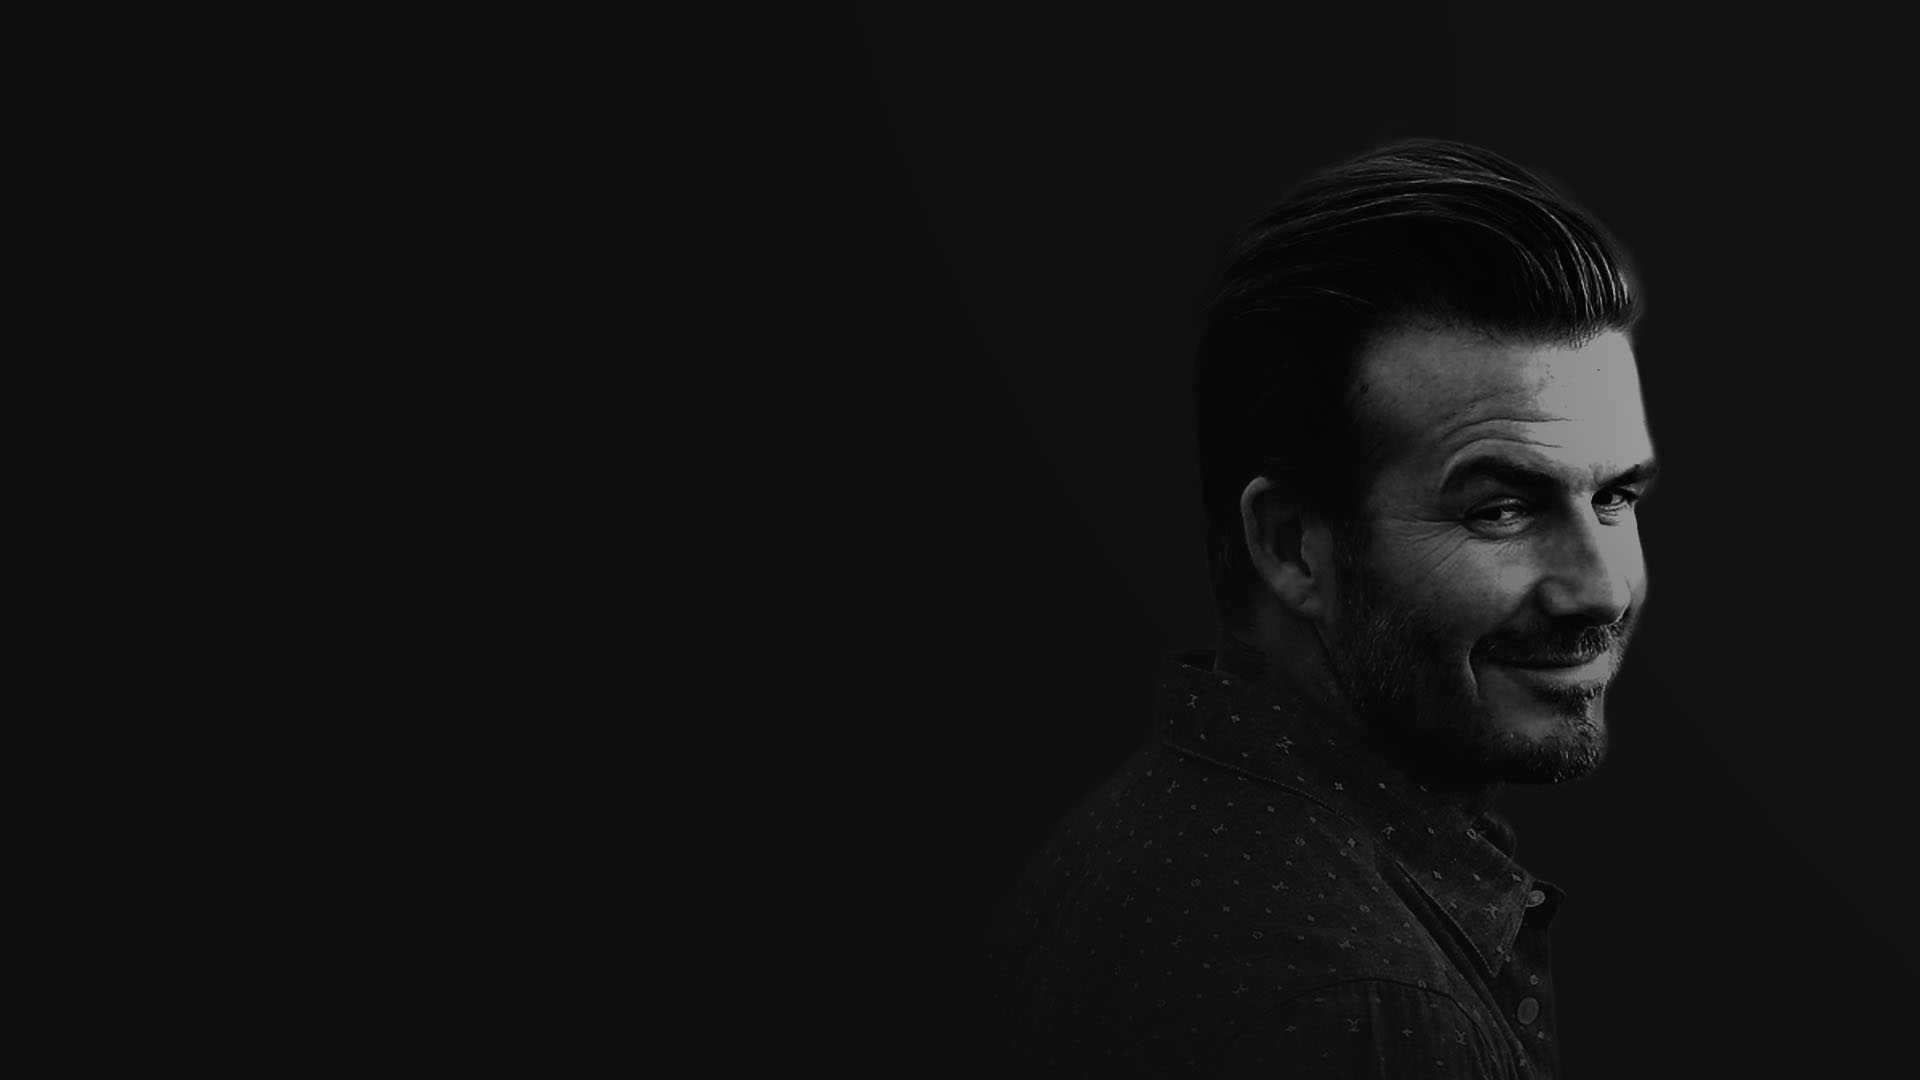 David Beckham Wallpapers HD Download 1920x1080